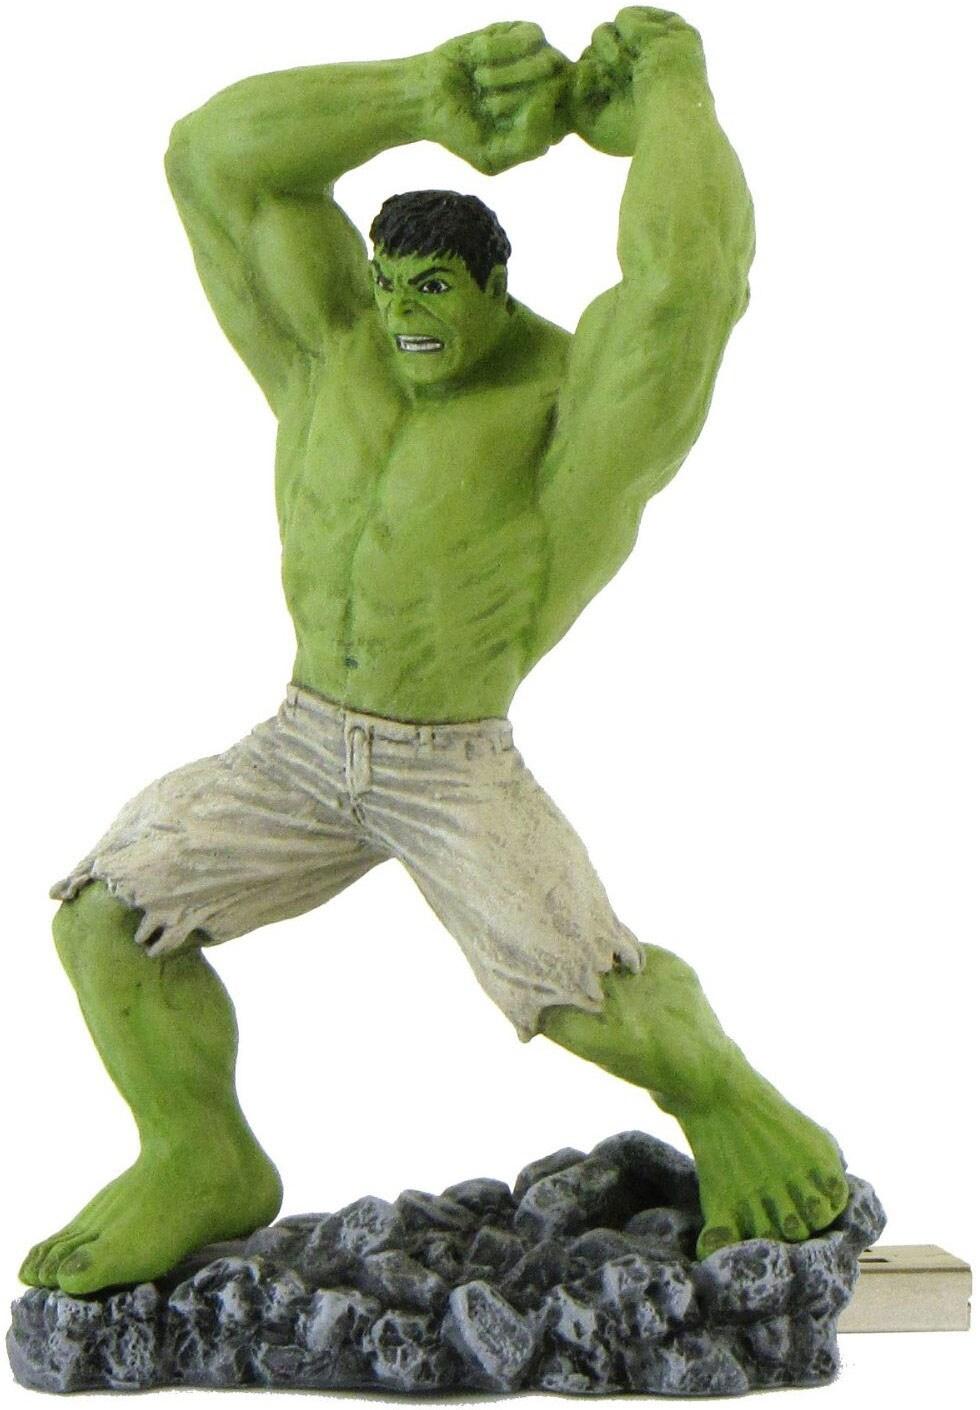 Marvel 8GB Avengers USB Flash Drive - Hulk